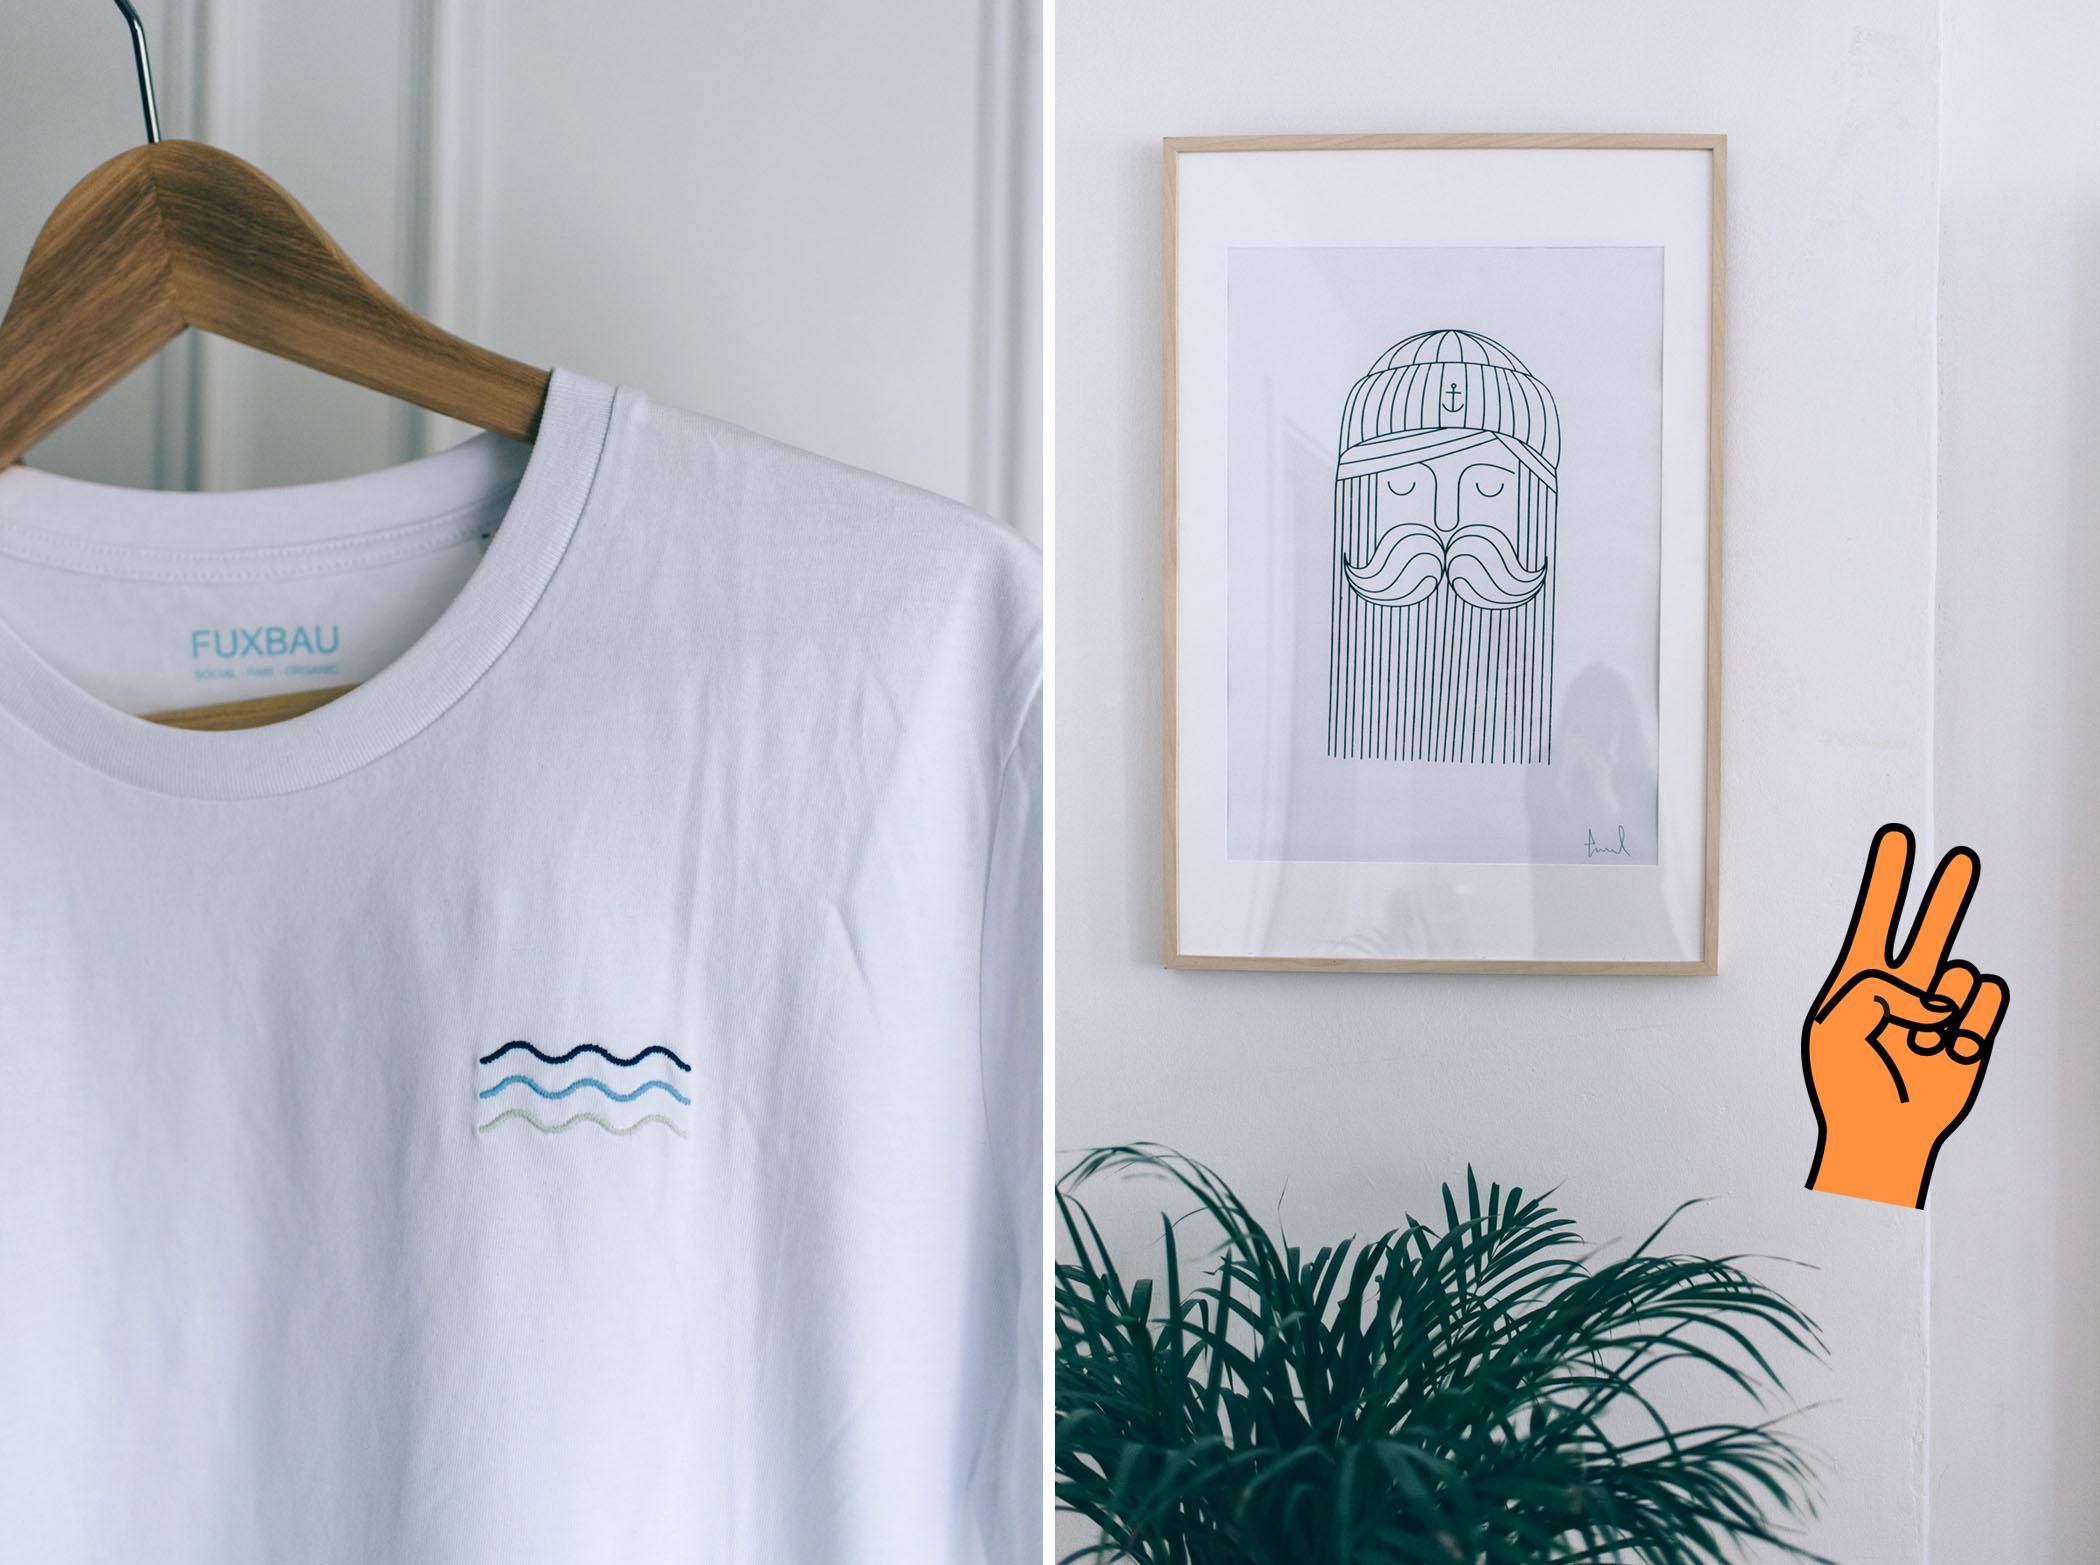 03-fuxbau-shirt